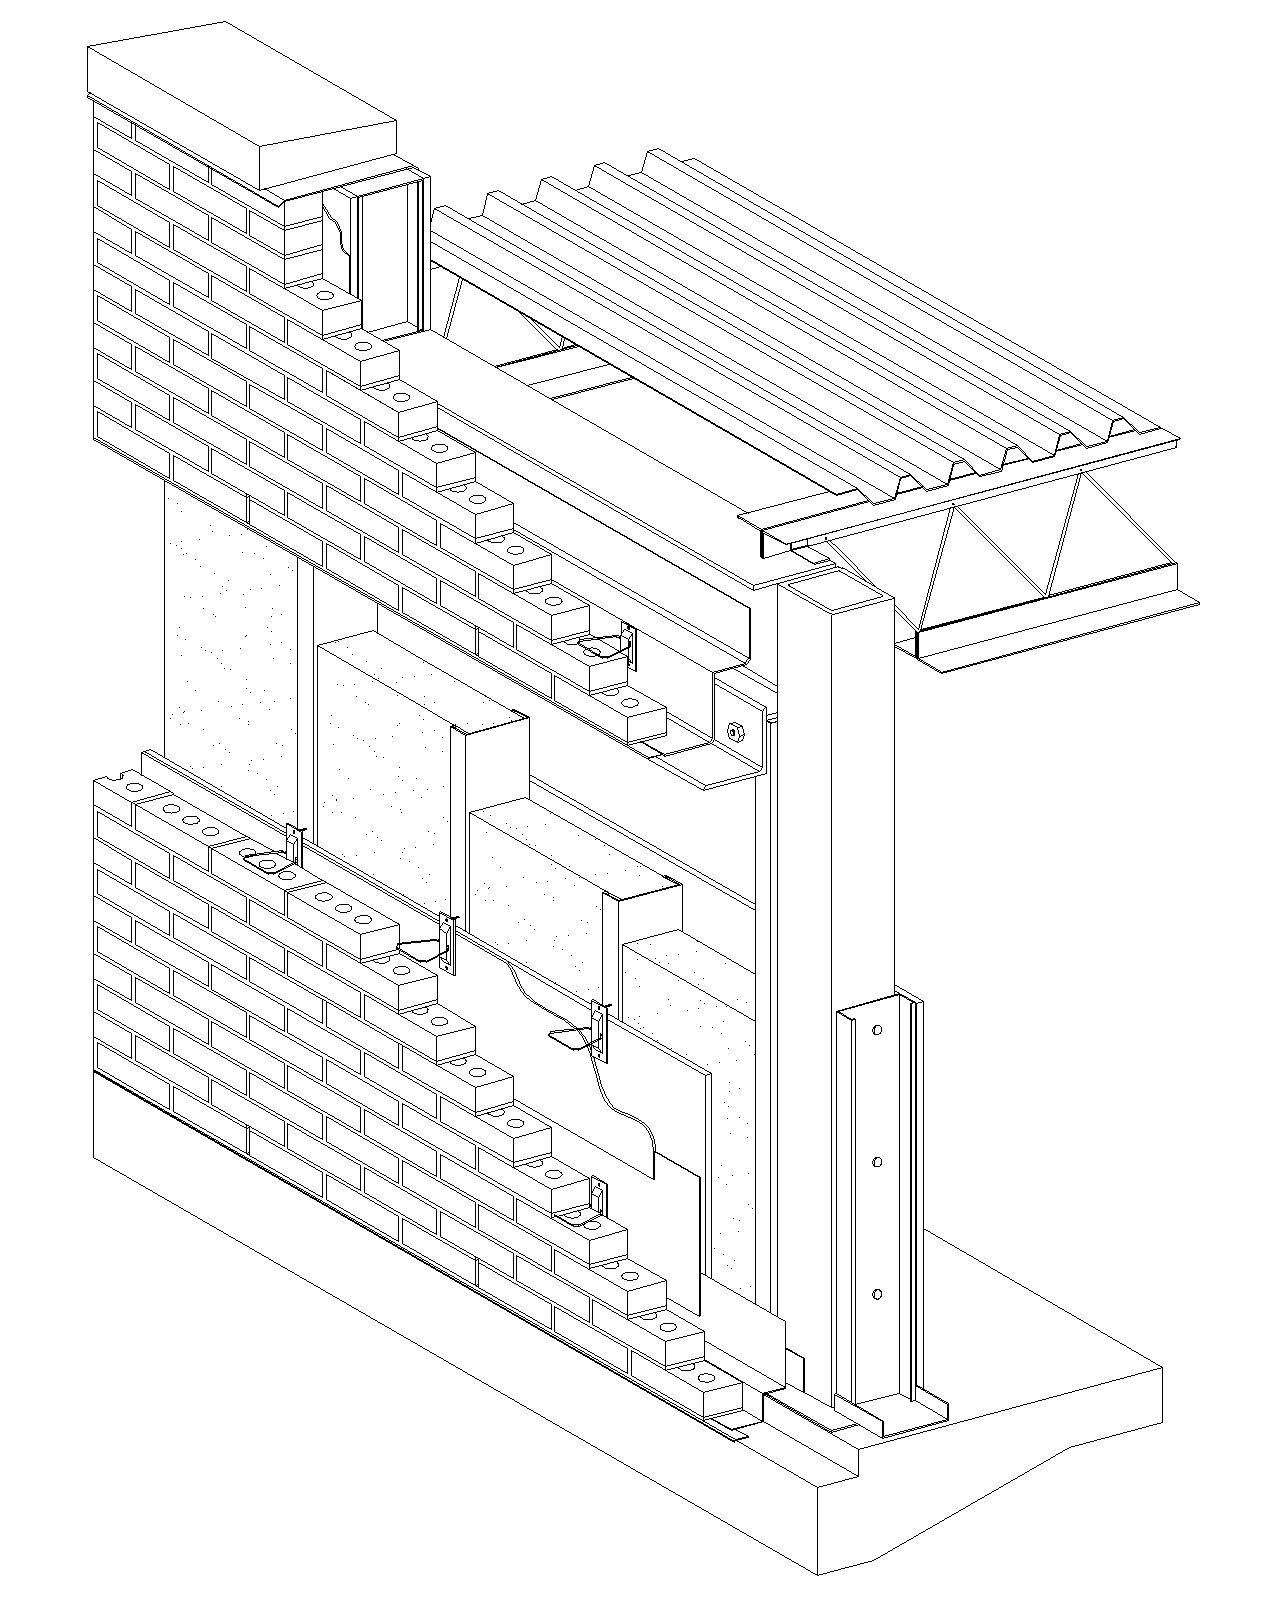 Cavity Wall: Brick Veneer/Steel Stud